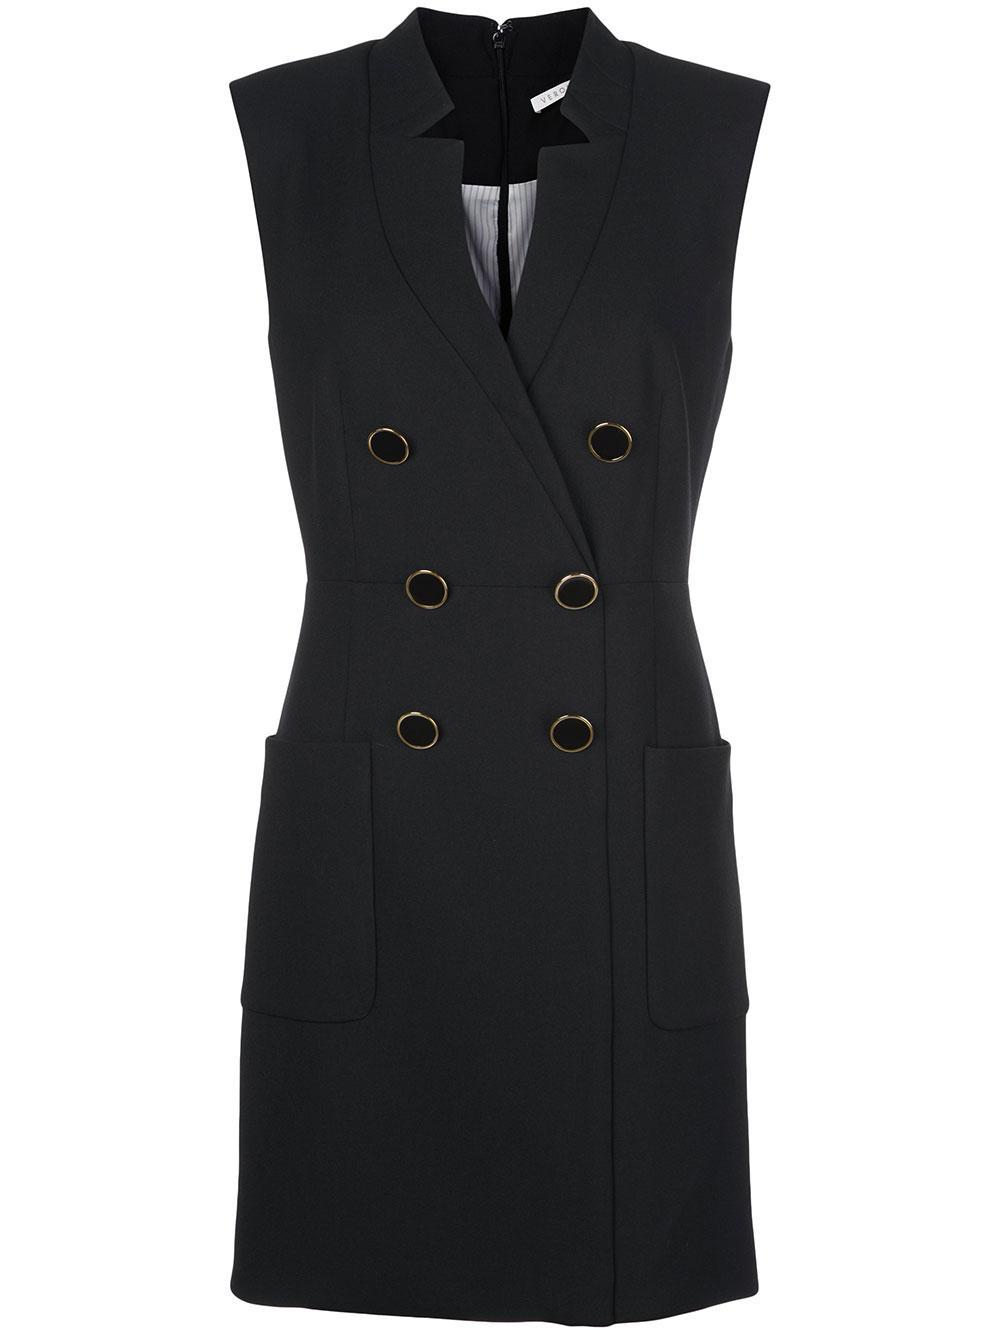 Doreen Cap Sleeve Double Breasted Blazer Dress